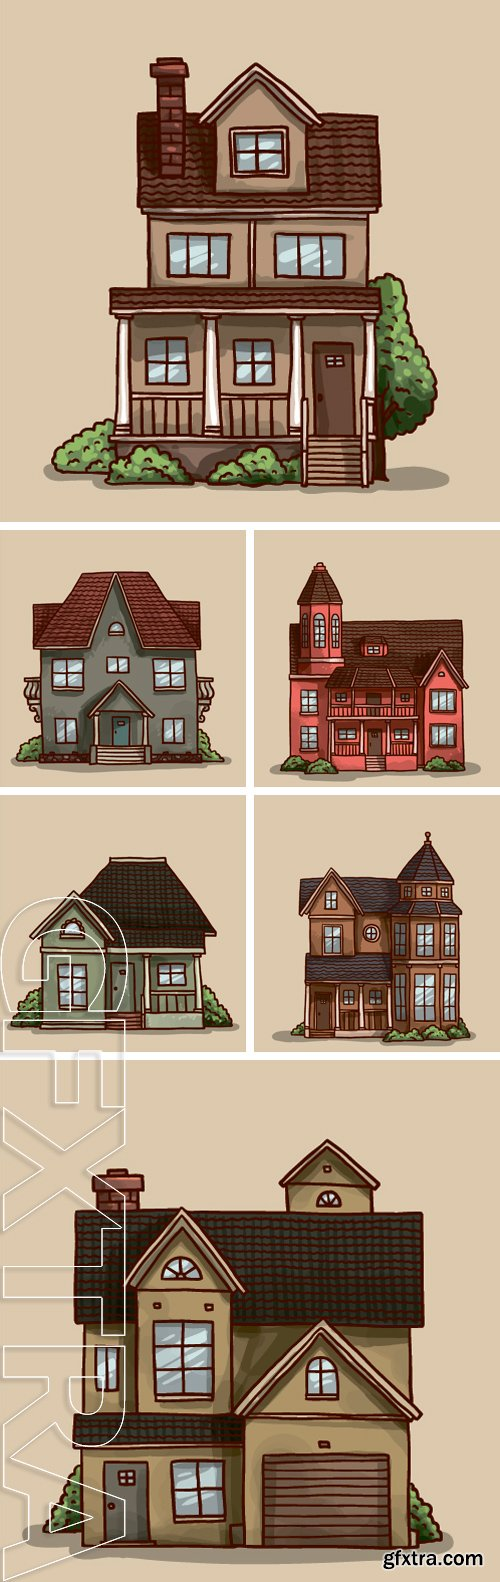 Stock Vectors - Small cute house, vector